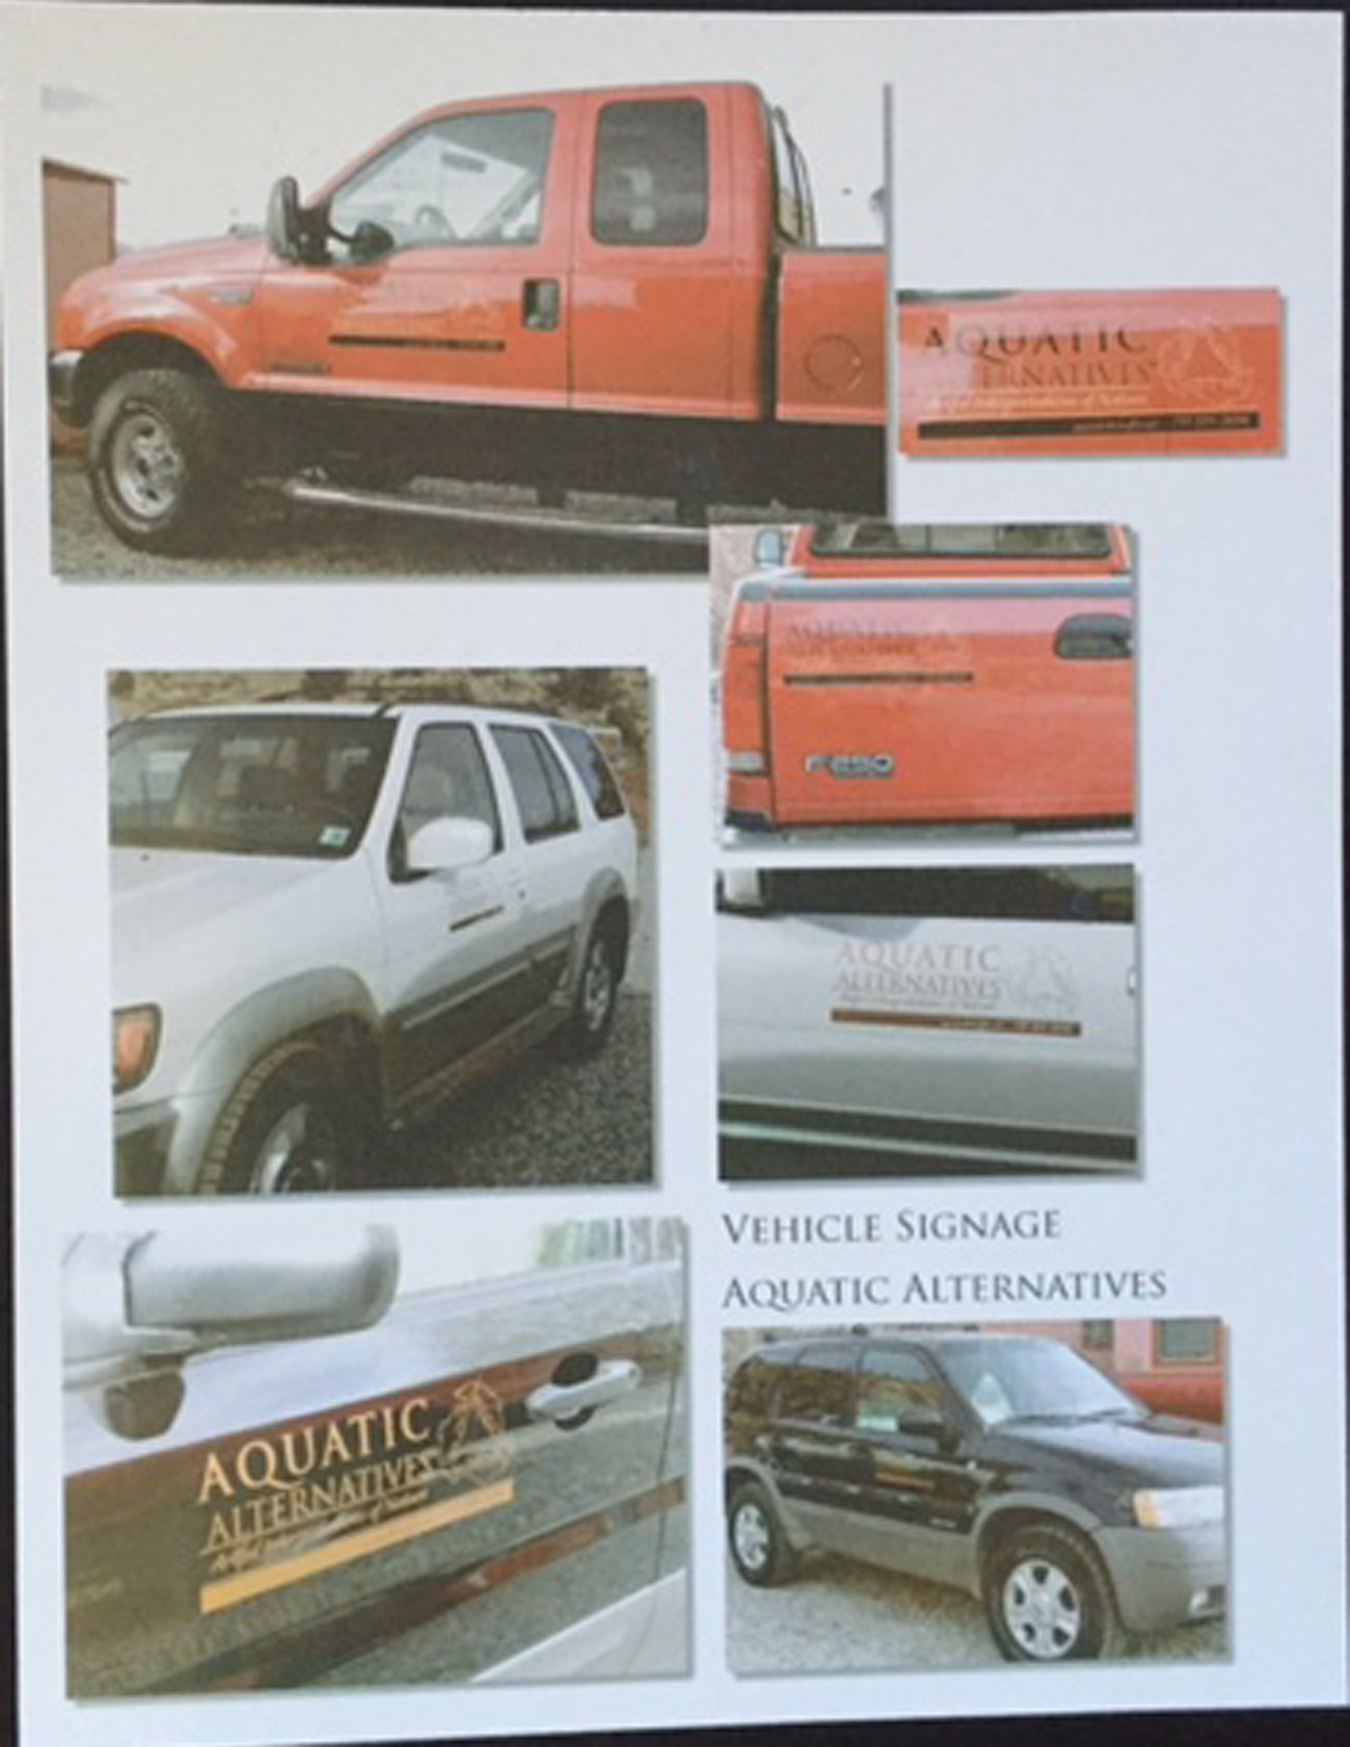 Vehiclesignage.jpg